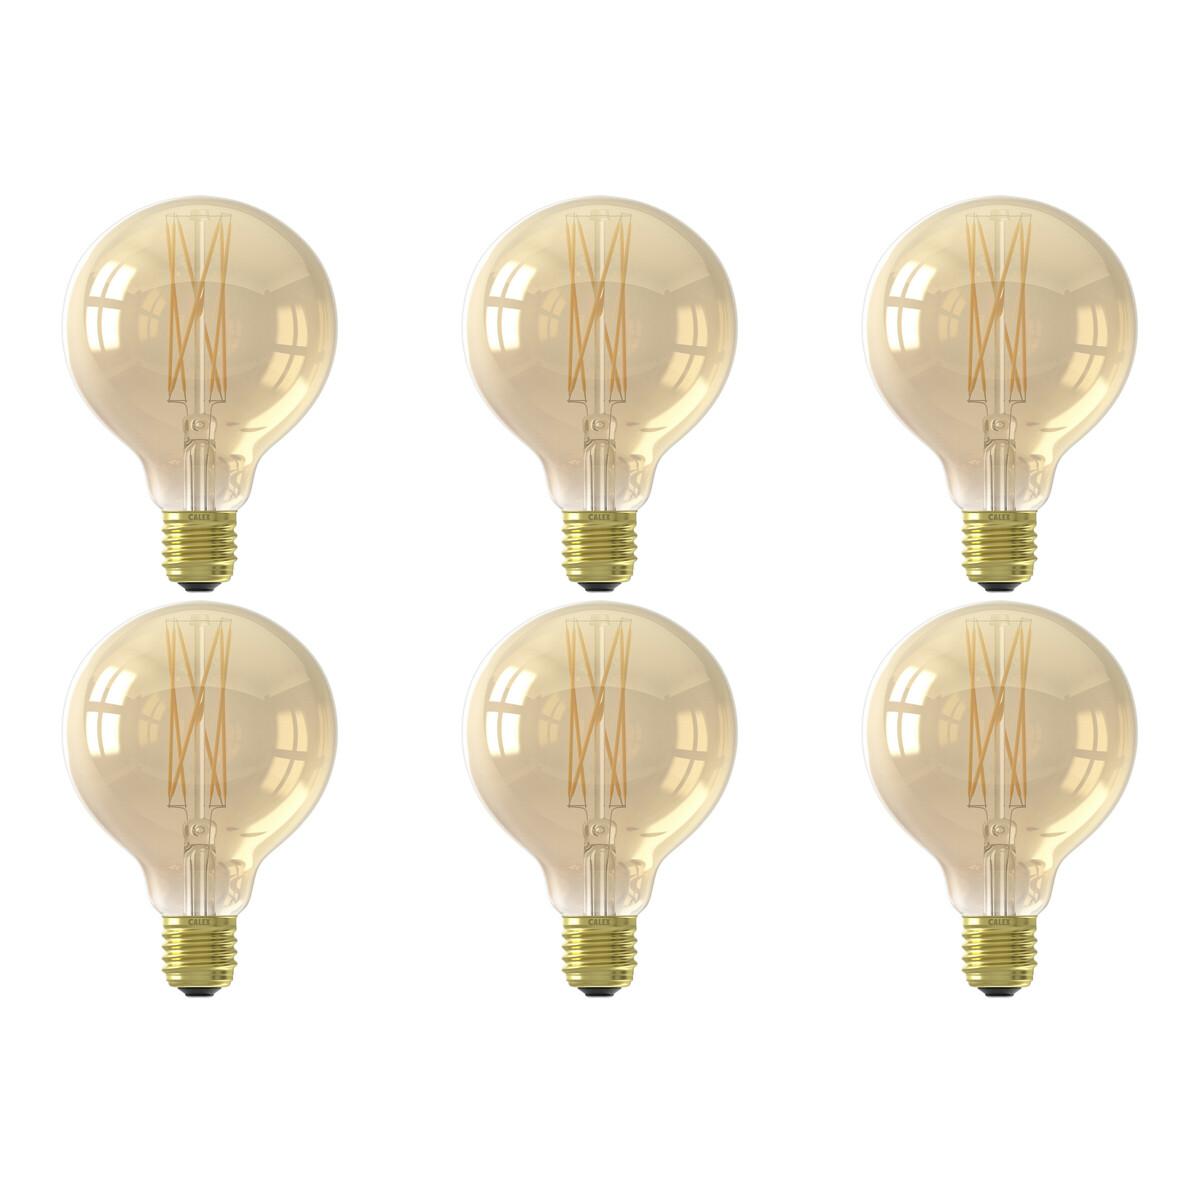 CALEX - LED Lamp 6 Pack - Globe - Filament G95 - E27 Fitting - Dimbaar - 4W - Warm Wit 2100K - Goud